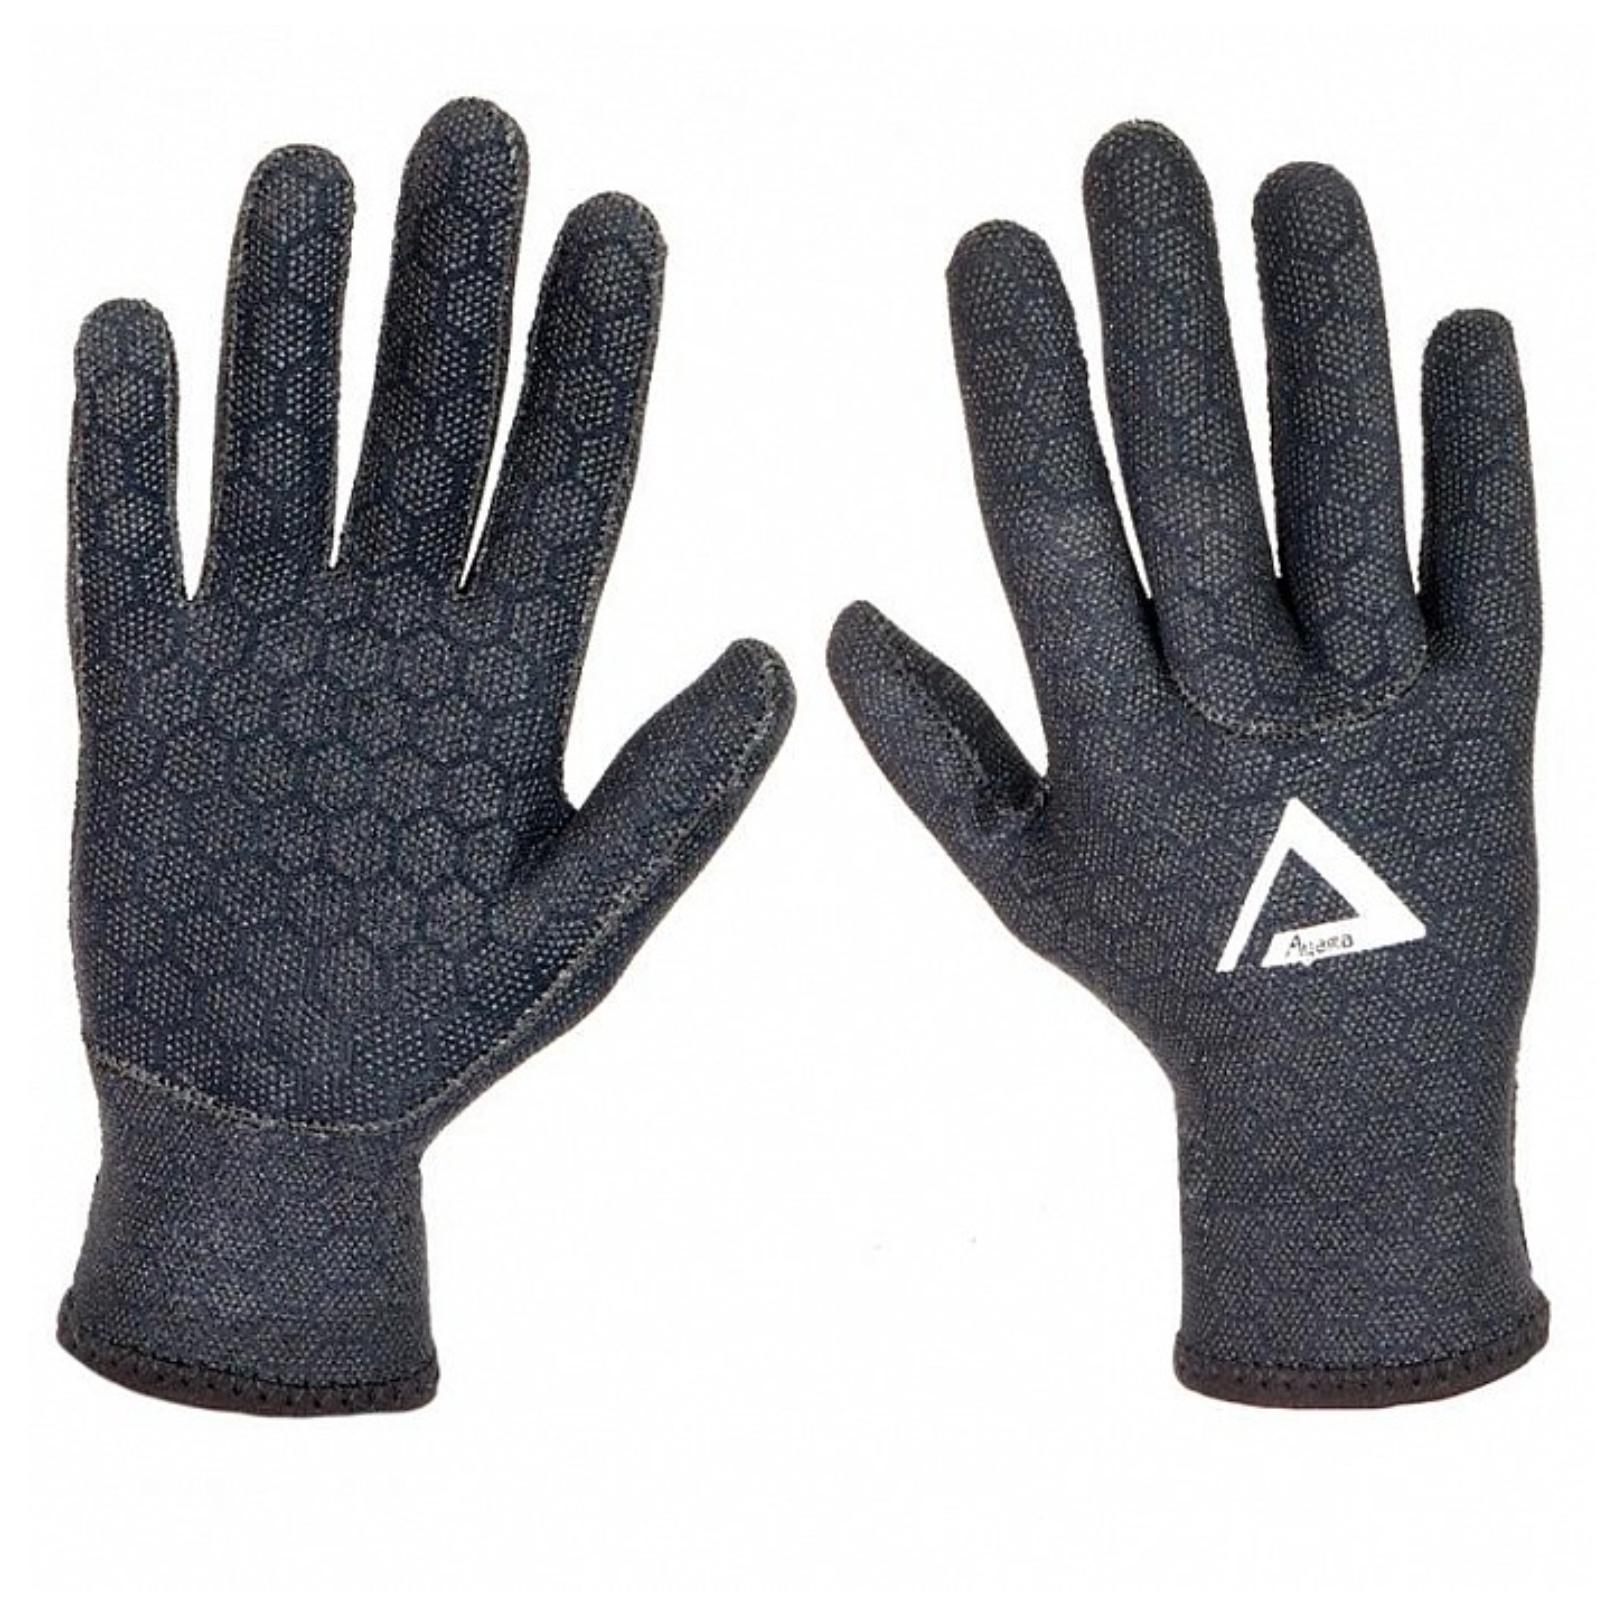 Neoprenové rukavice AGAMA Superstretch 3 mm - vel. S